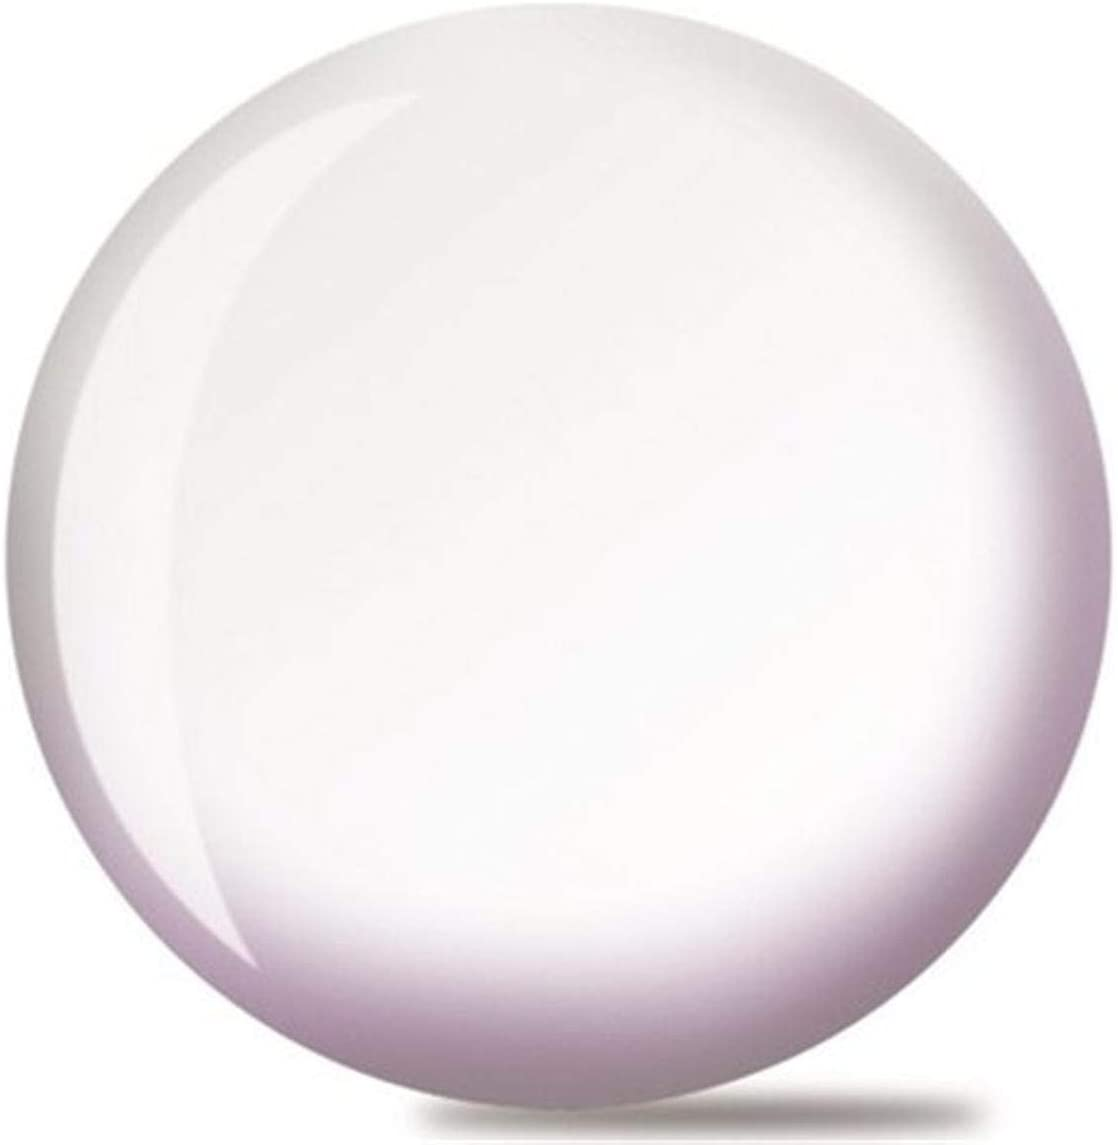 Brunswick Bowling Products Viz-A-Ball Bowling Ball 6Lbs, White, 15 lbs